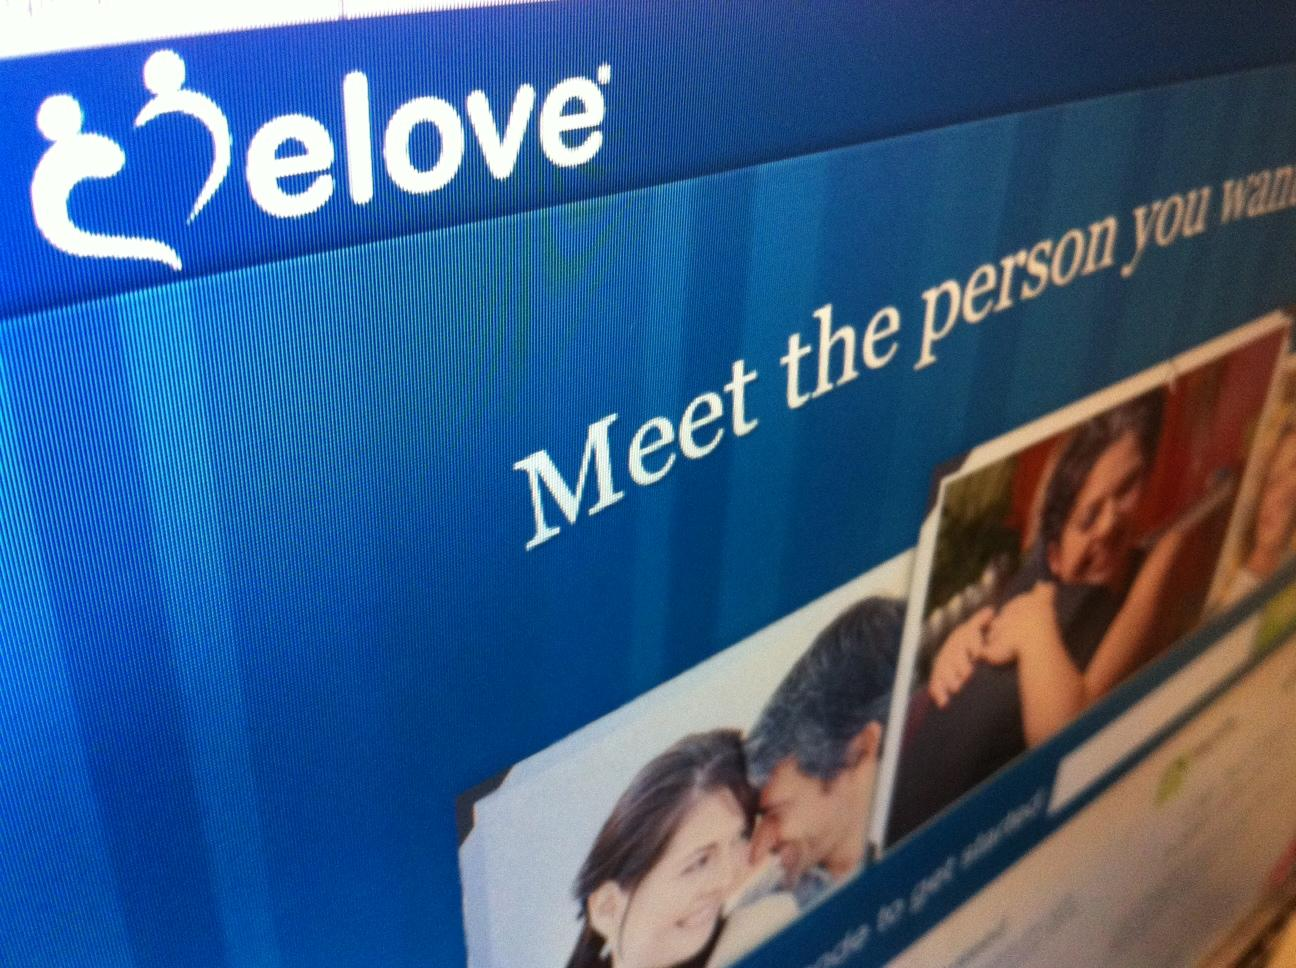 Elove matchmaking complaints